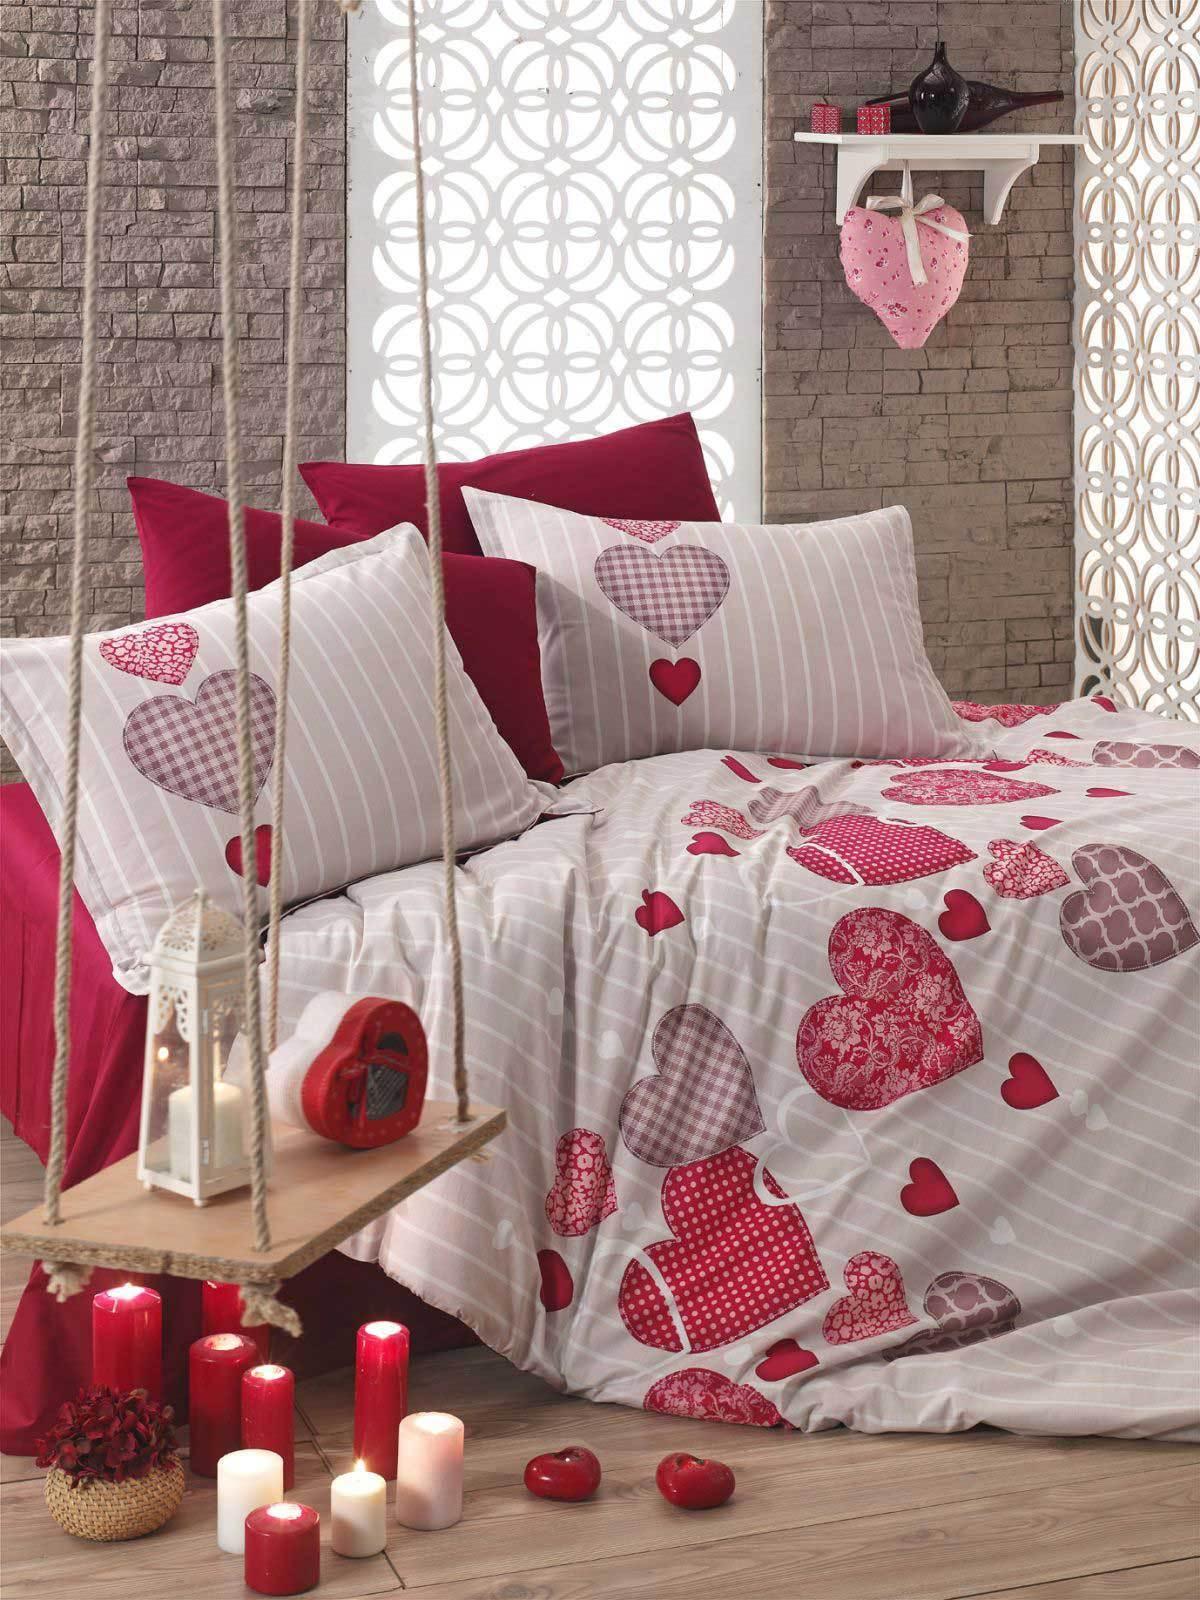 Bettwäsche 220x240 cm Bettgarnitur Bettbezug Baumwolle Kissen 6 tlg HEART ROT